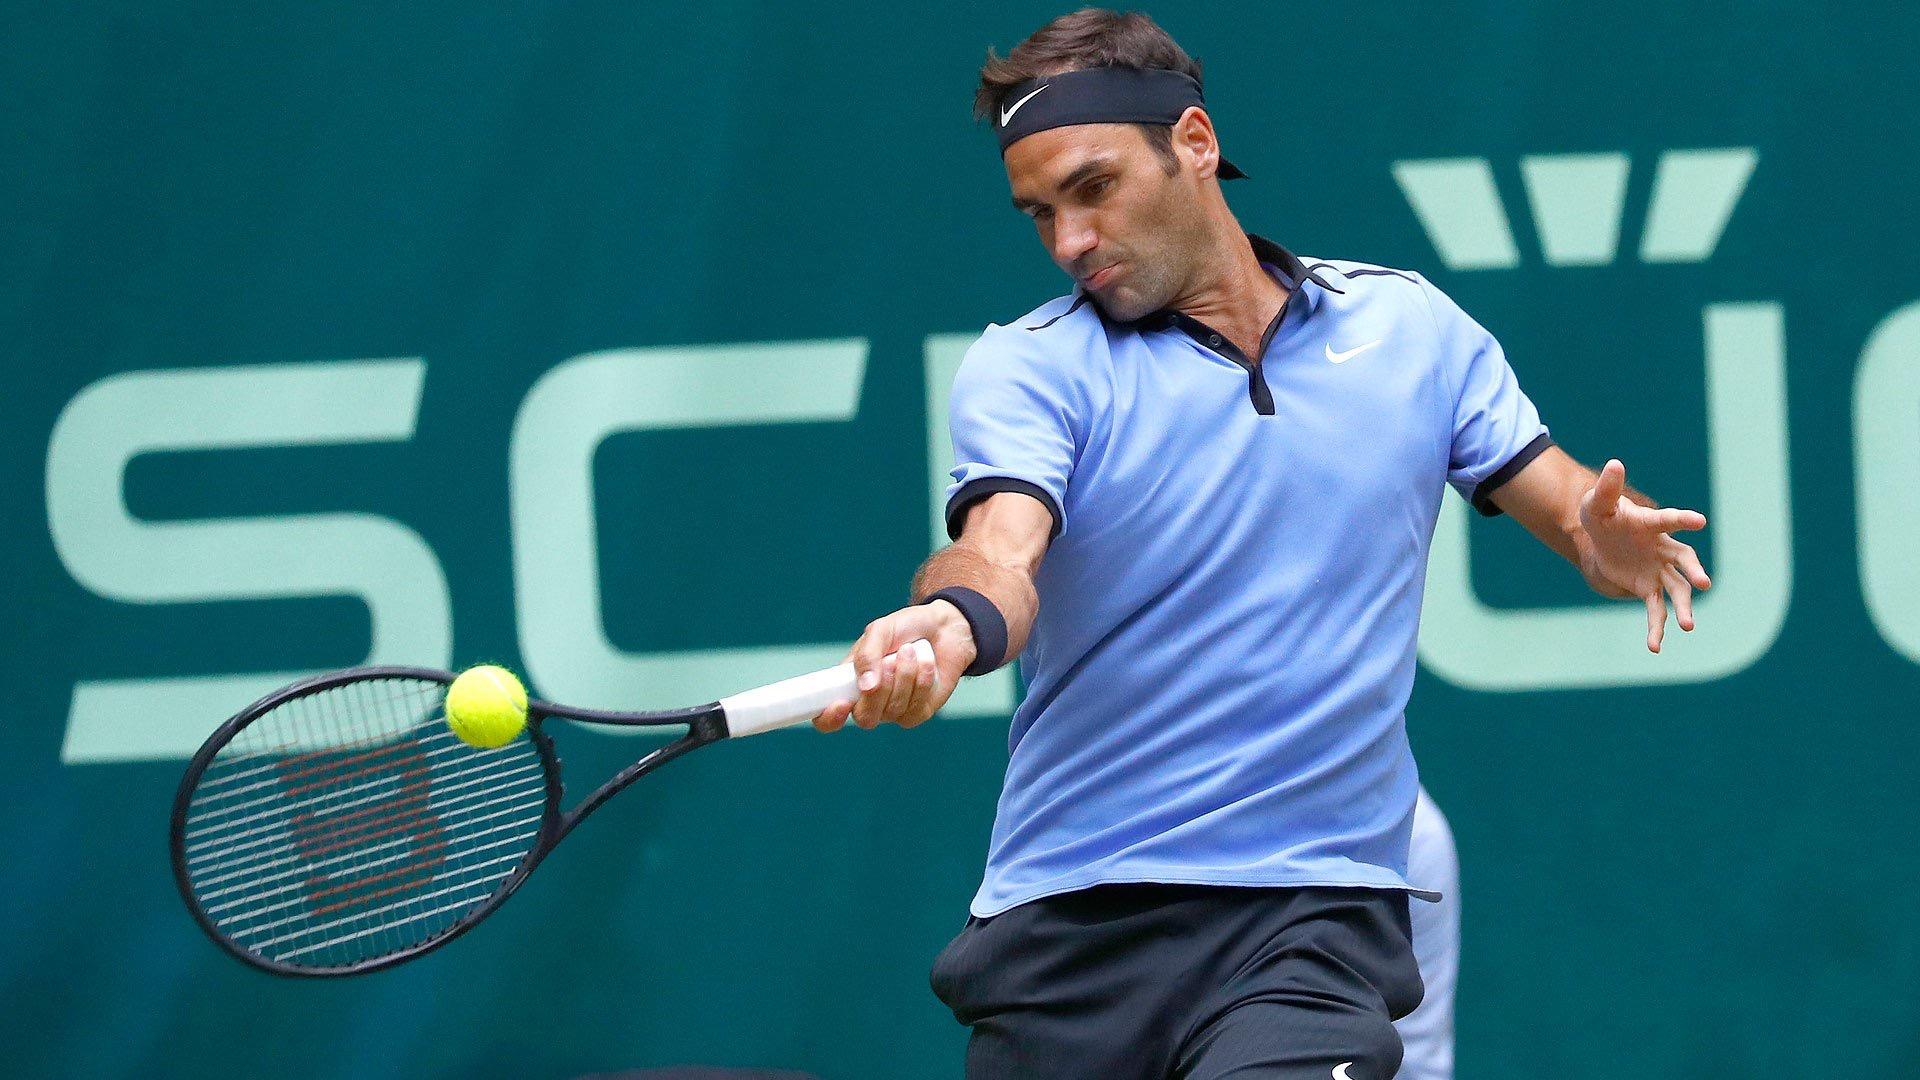 Roger Federer 2017 Gerry Weber Open